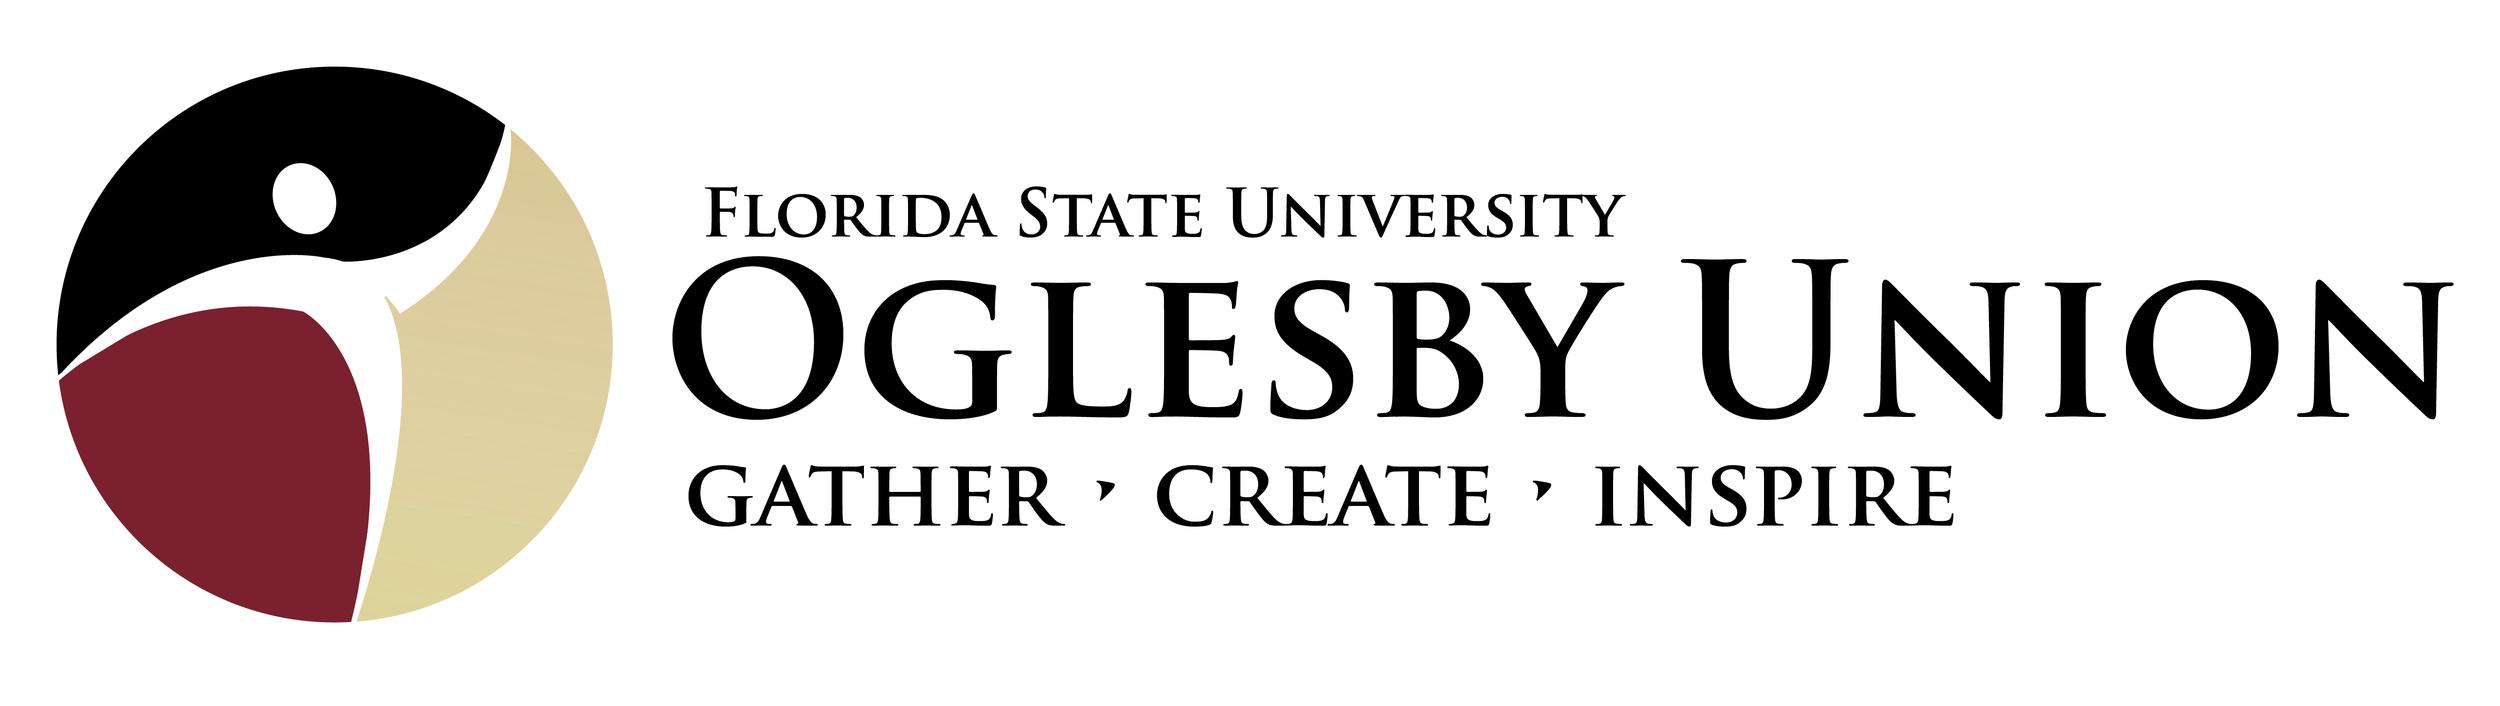 FSU Oglesby Union Logo Design